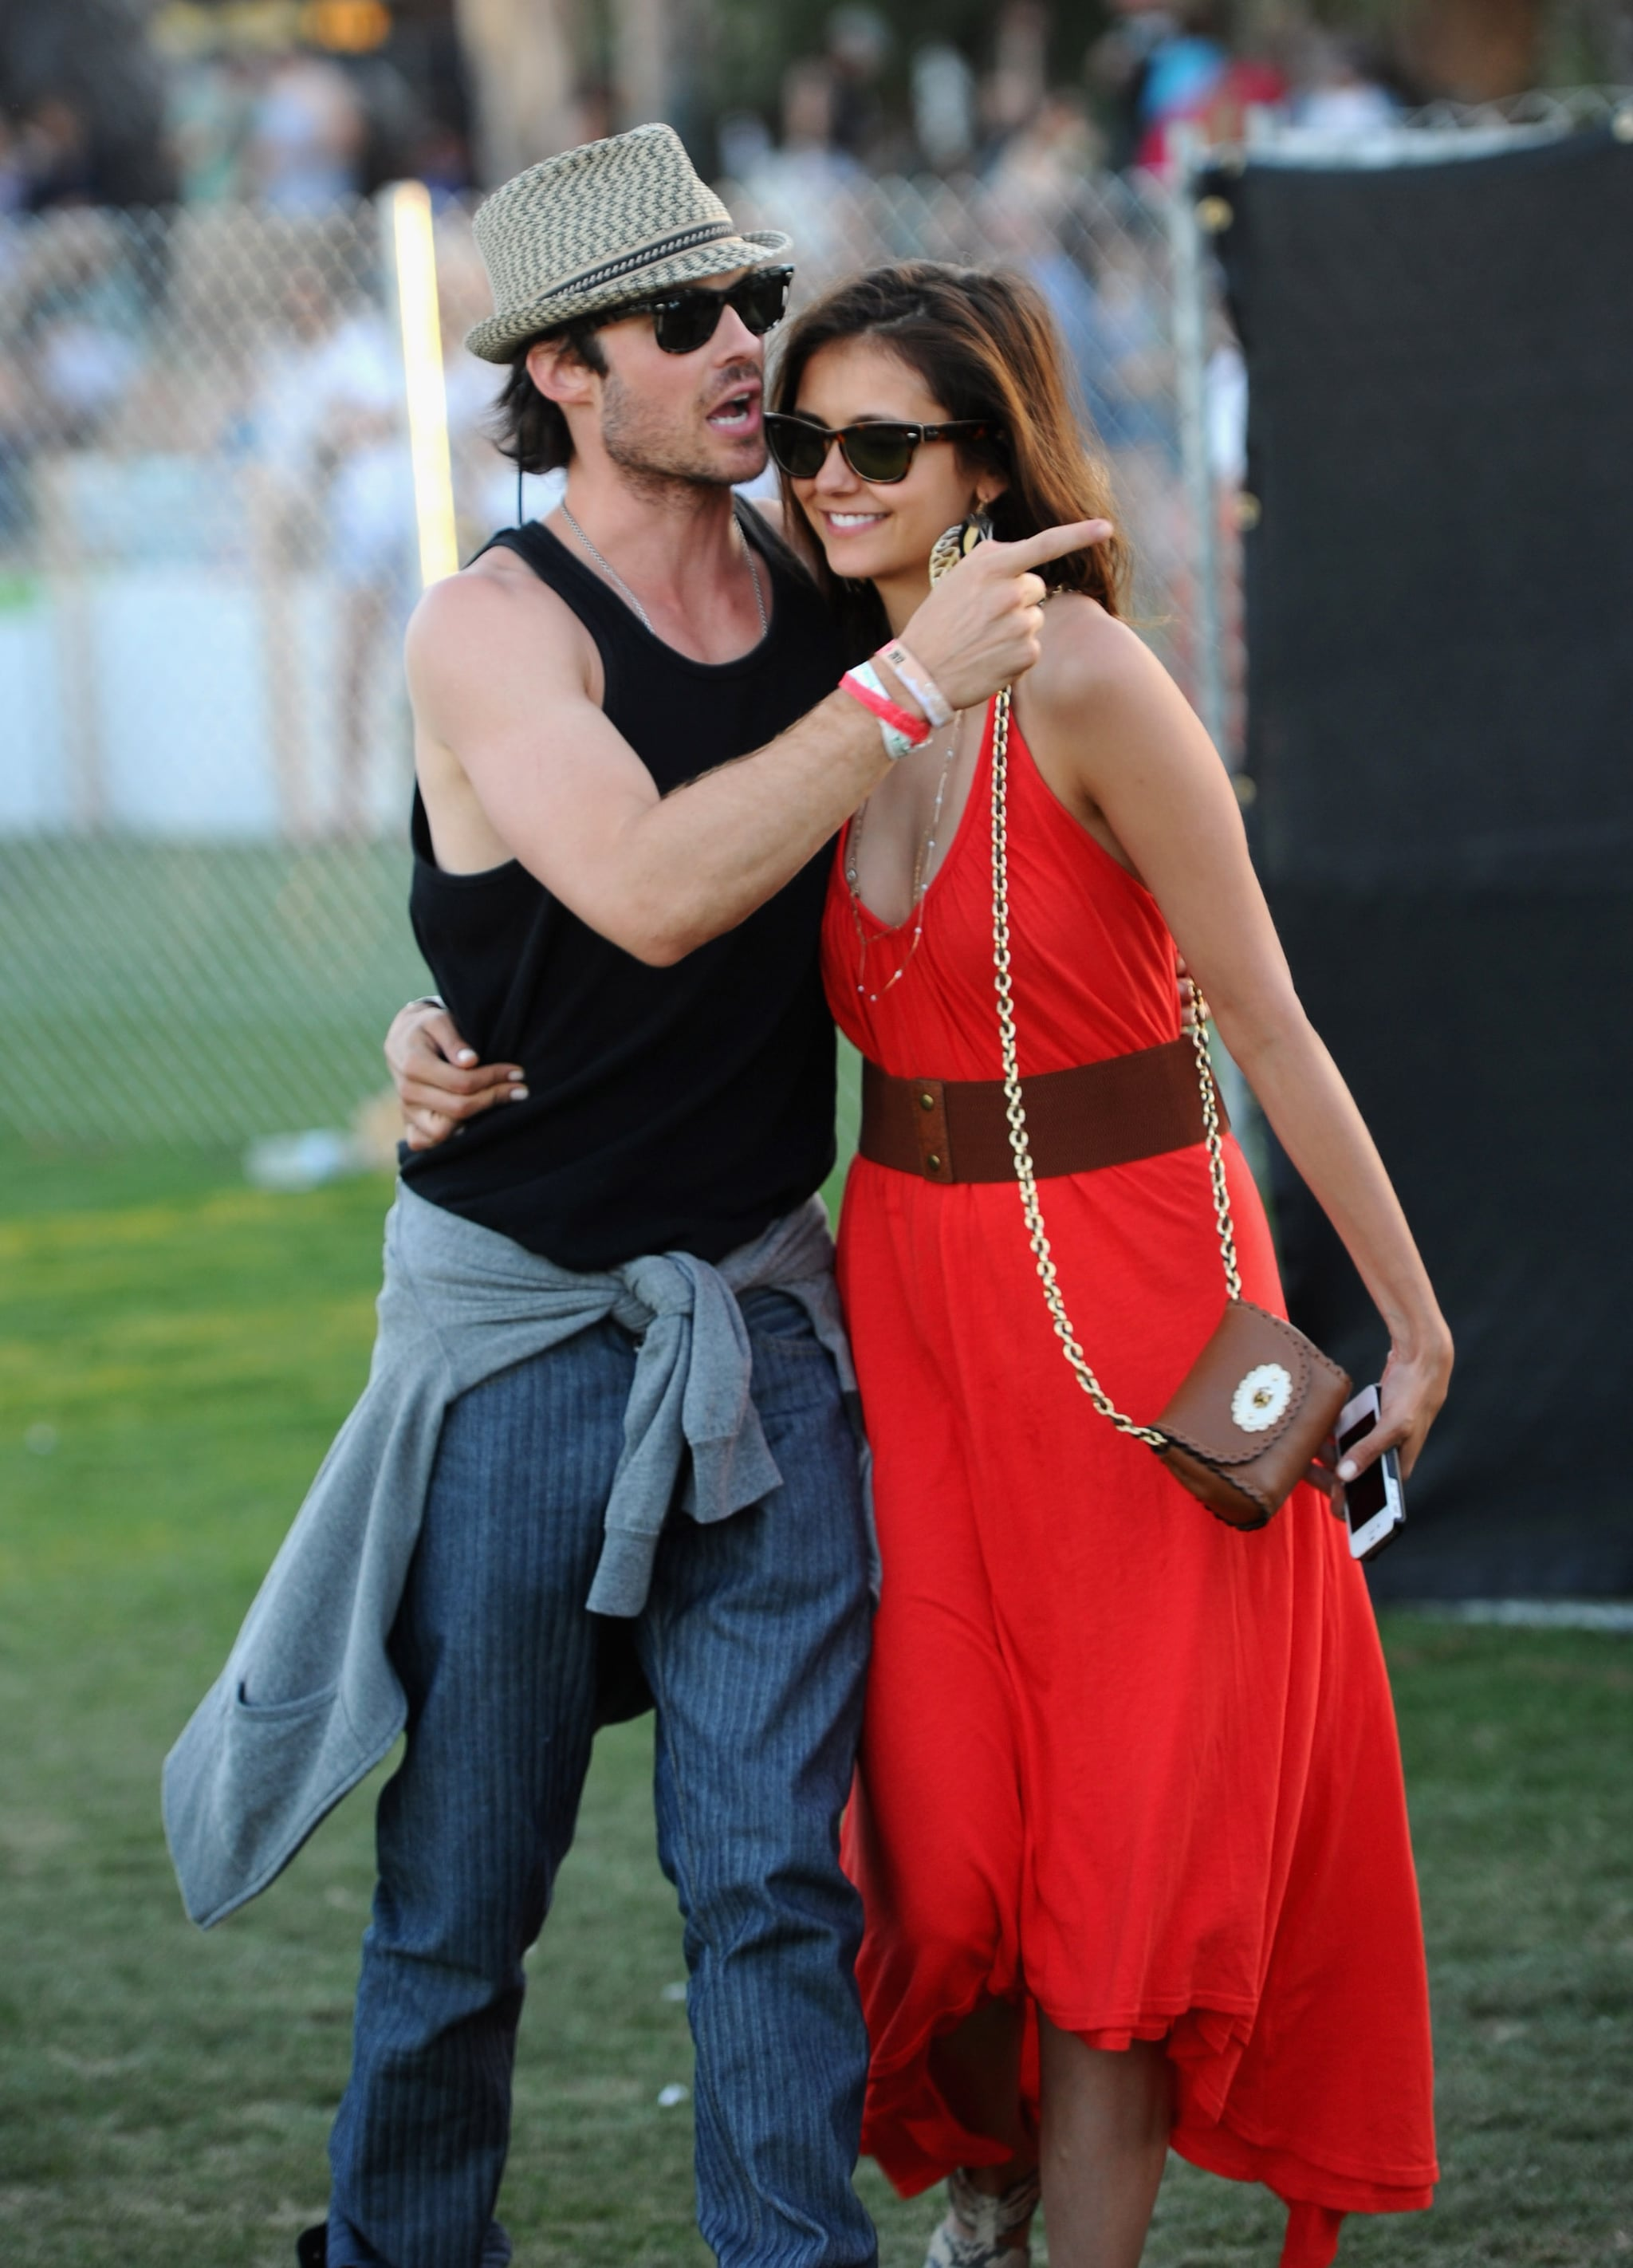 Nina Dobrev and Ian Somerhalder showed PDA on the last day of the festival in 2012.